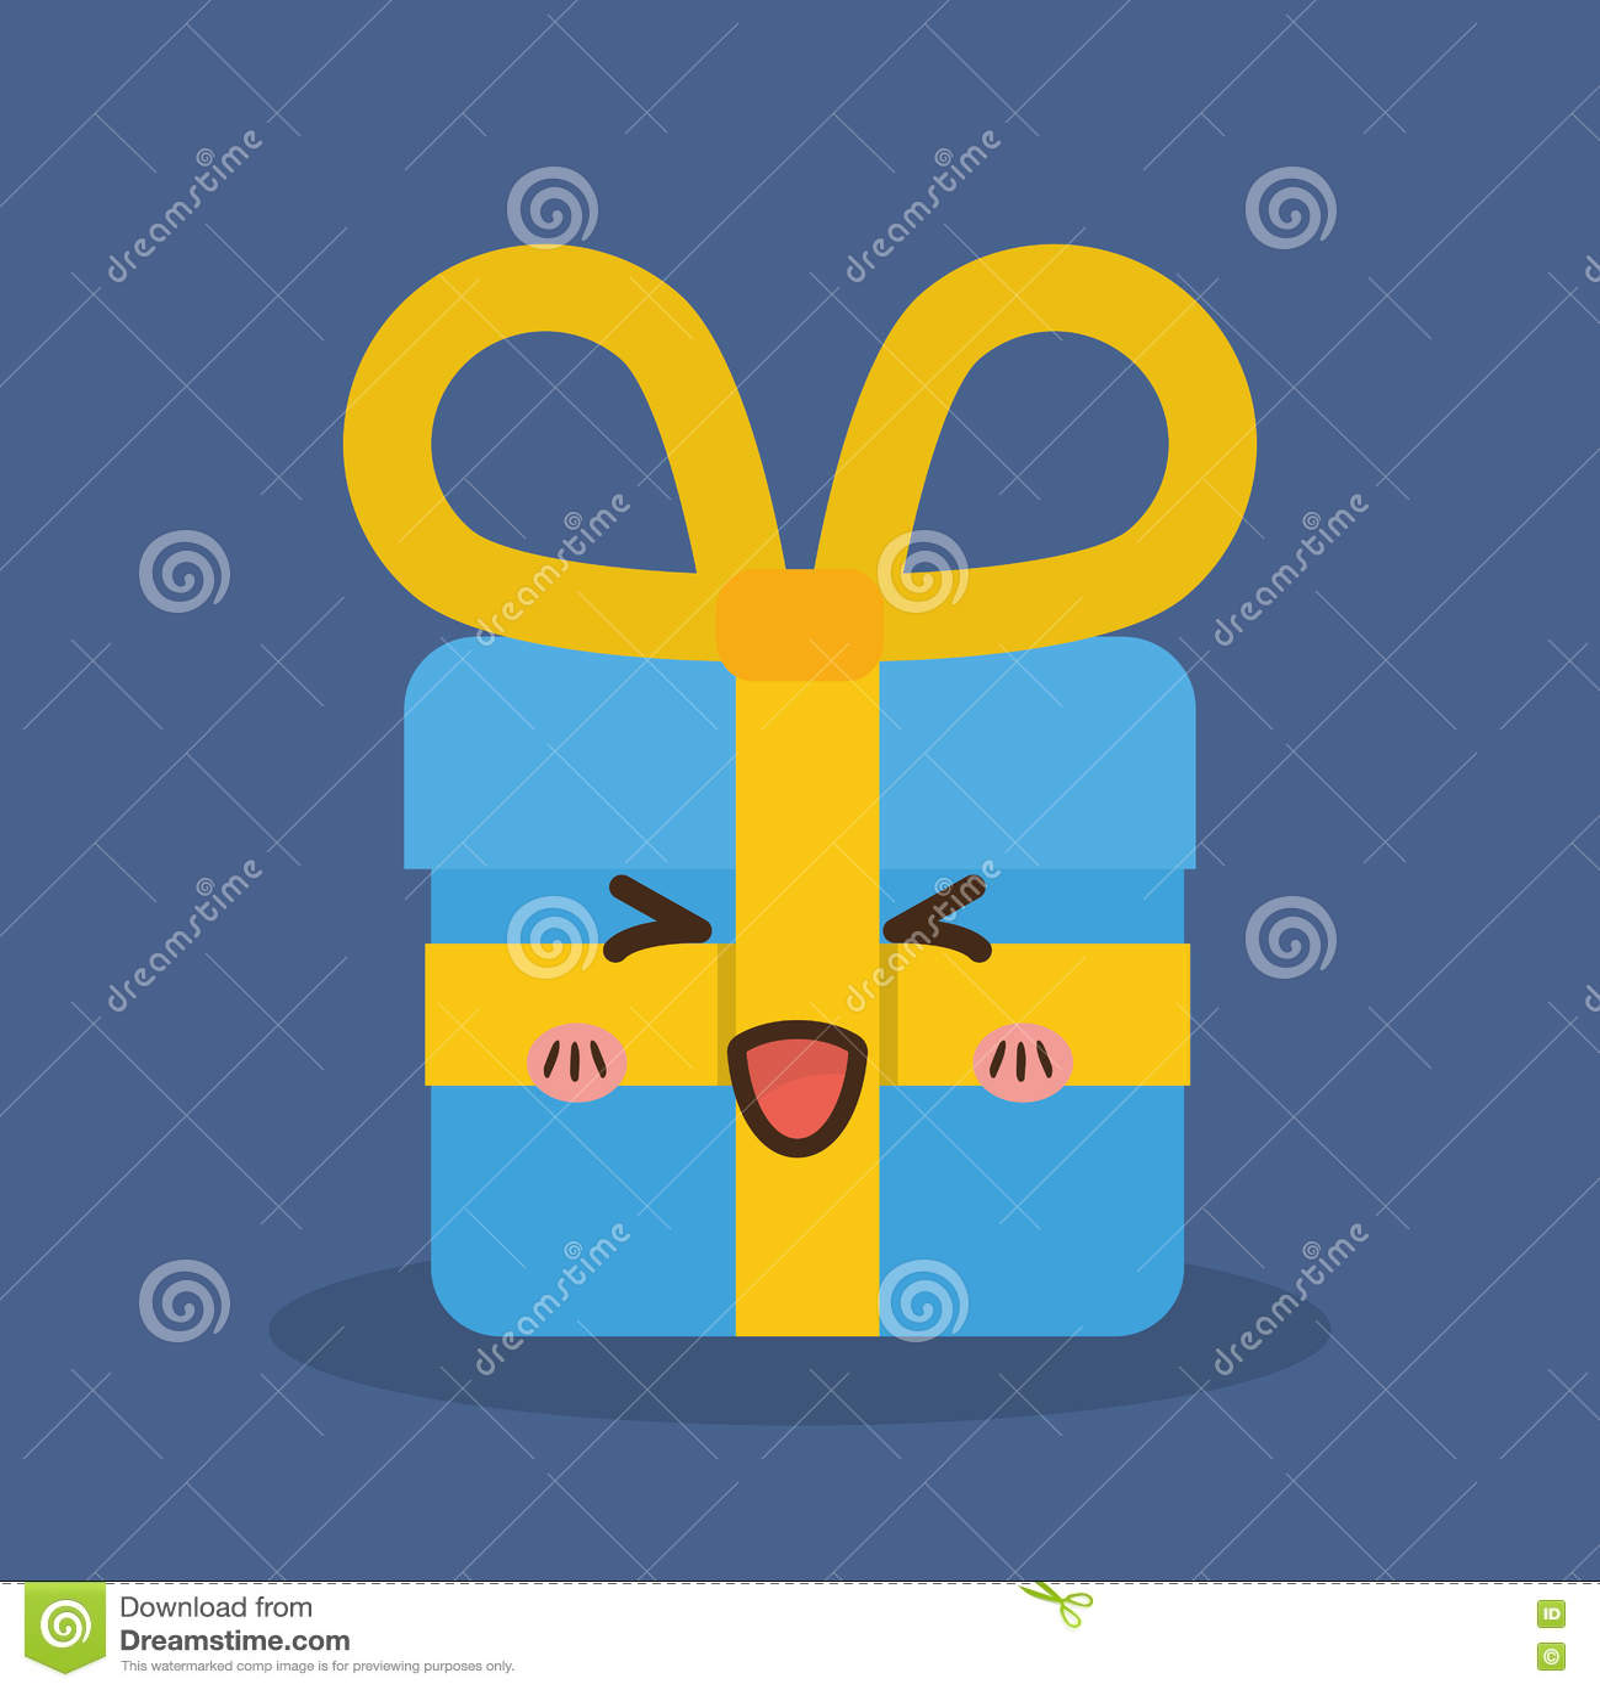 Icône De Cadeau De Kawaii Conception De Joyeux Noël Dessin